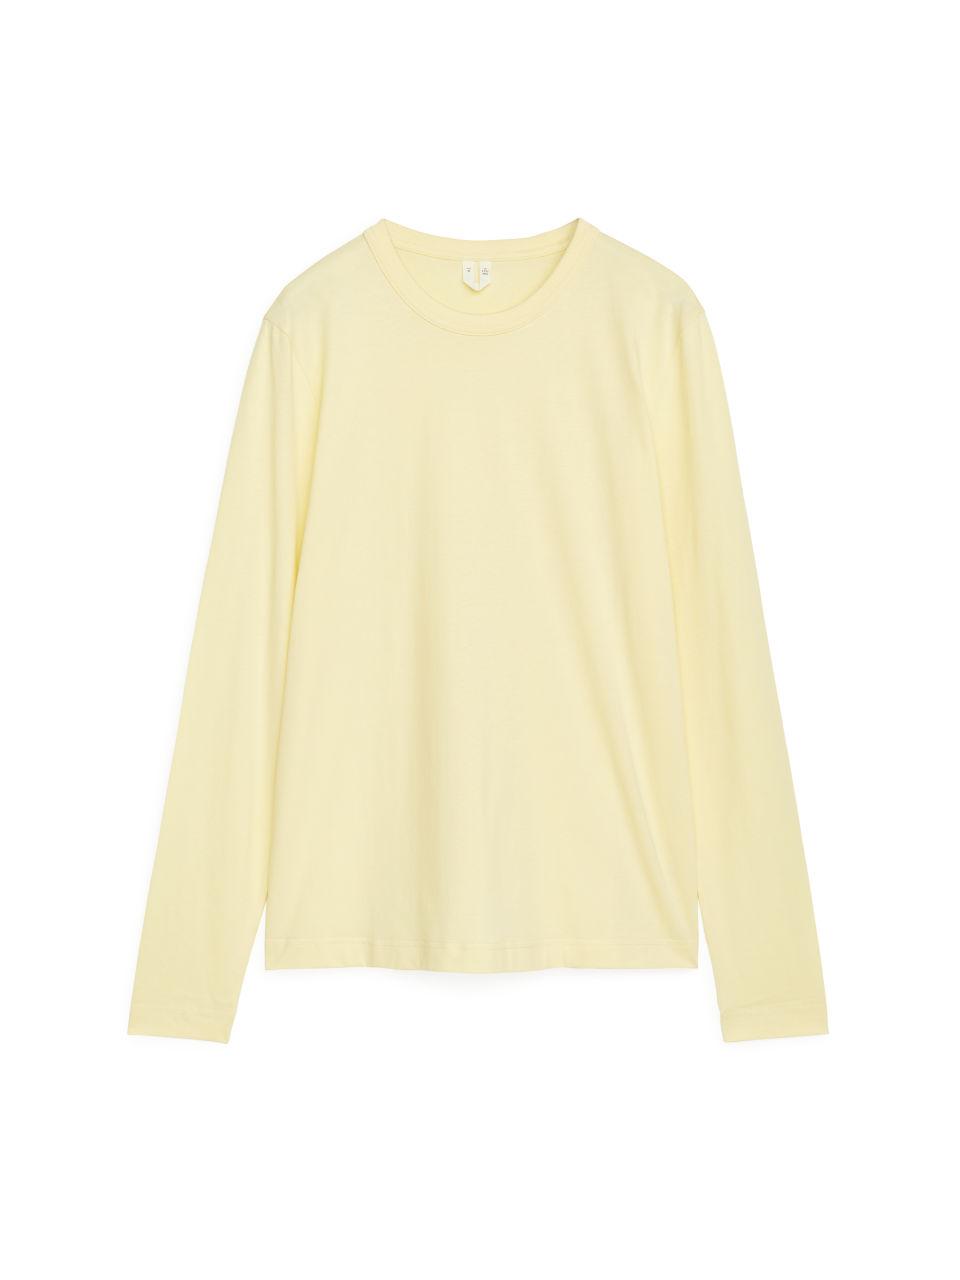 Long-Sleeved T-Shirt - Yellow